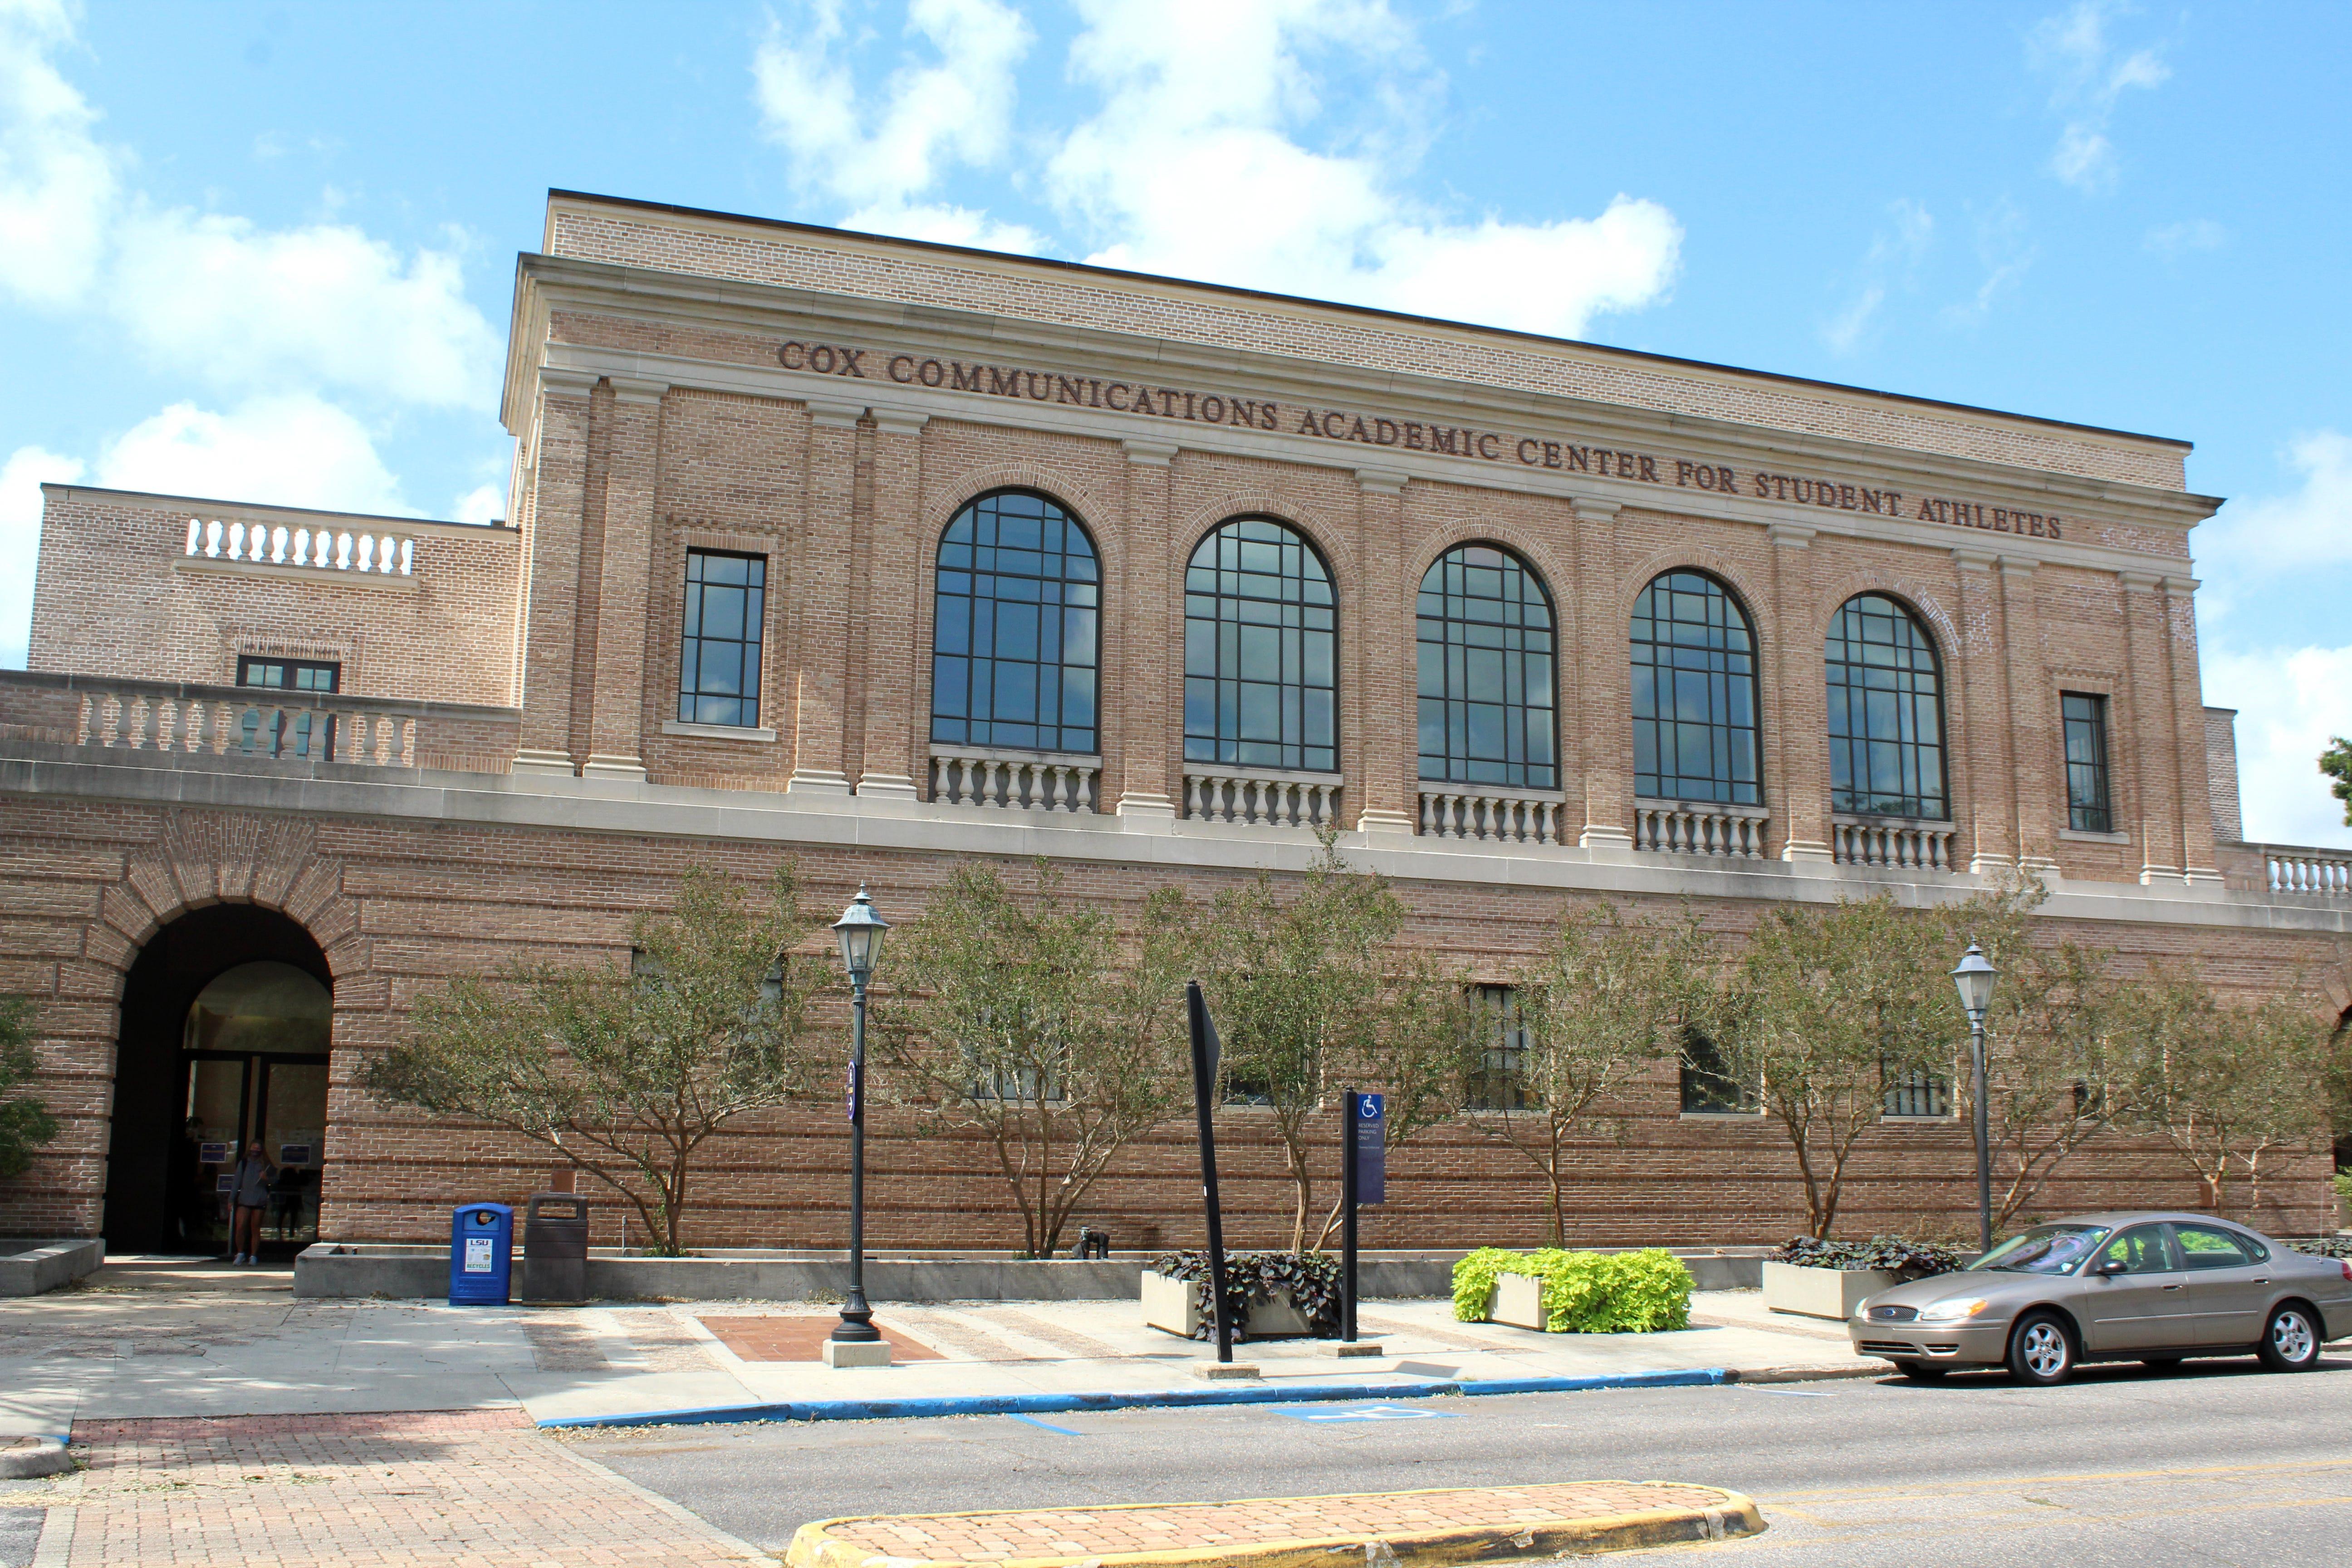 Louisiana State University Cox Communications Academic Center for Student-Athletes